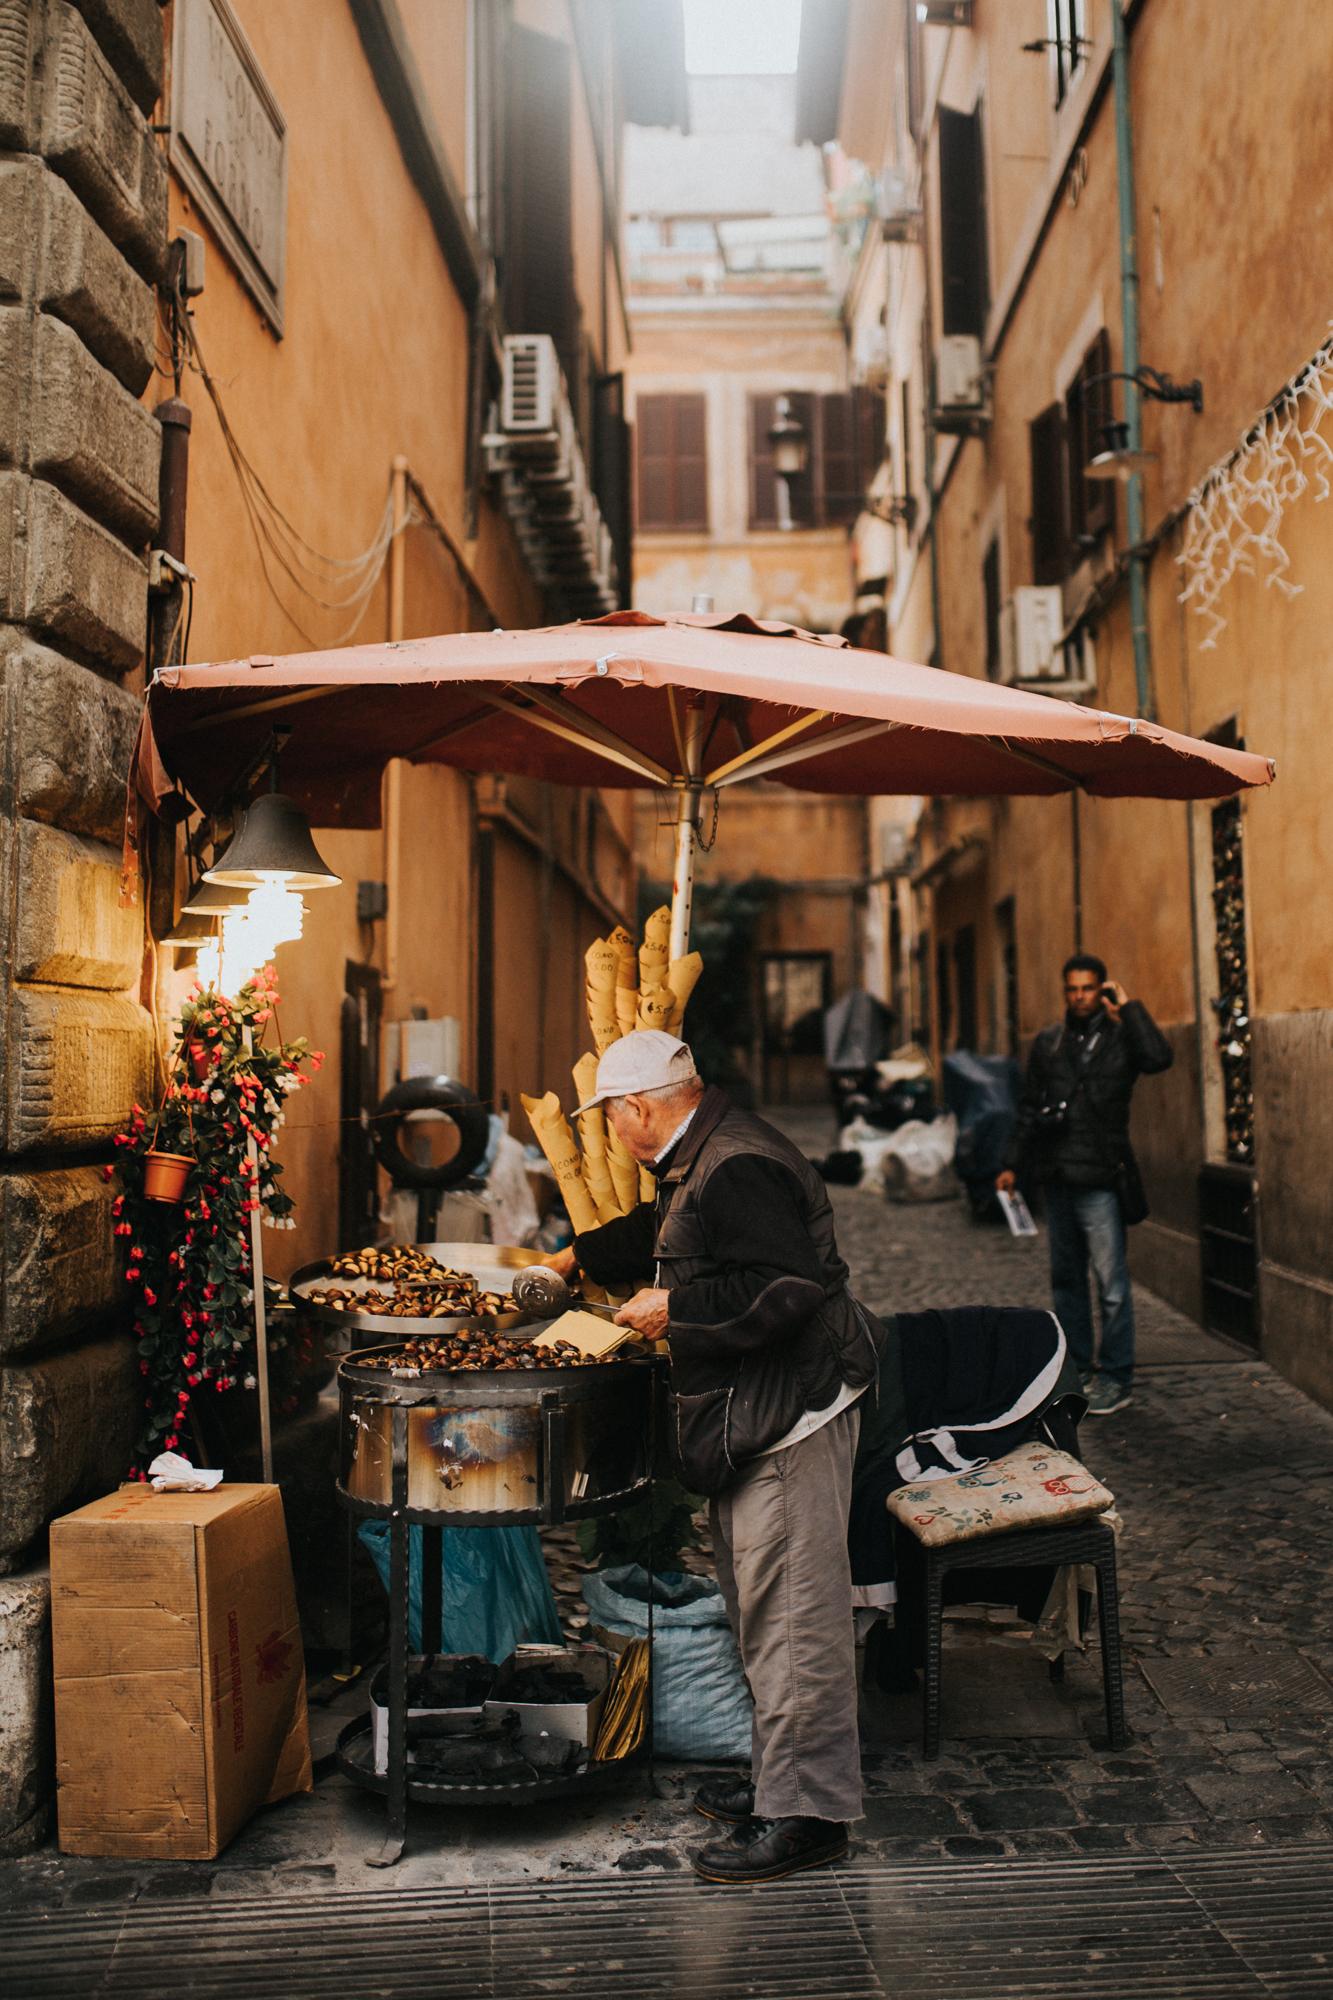 Italy - Rome Travel Photography - Chestnut Roaster